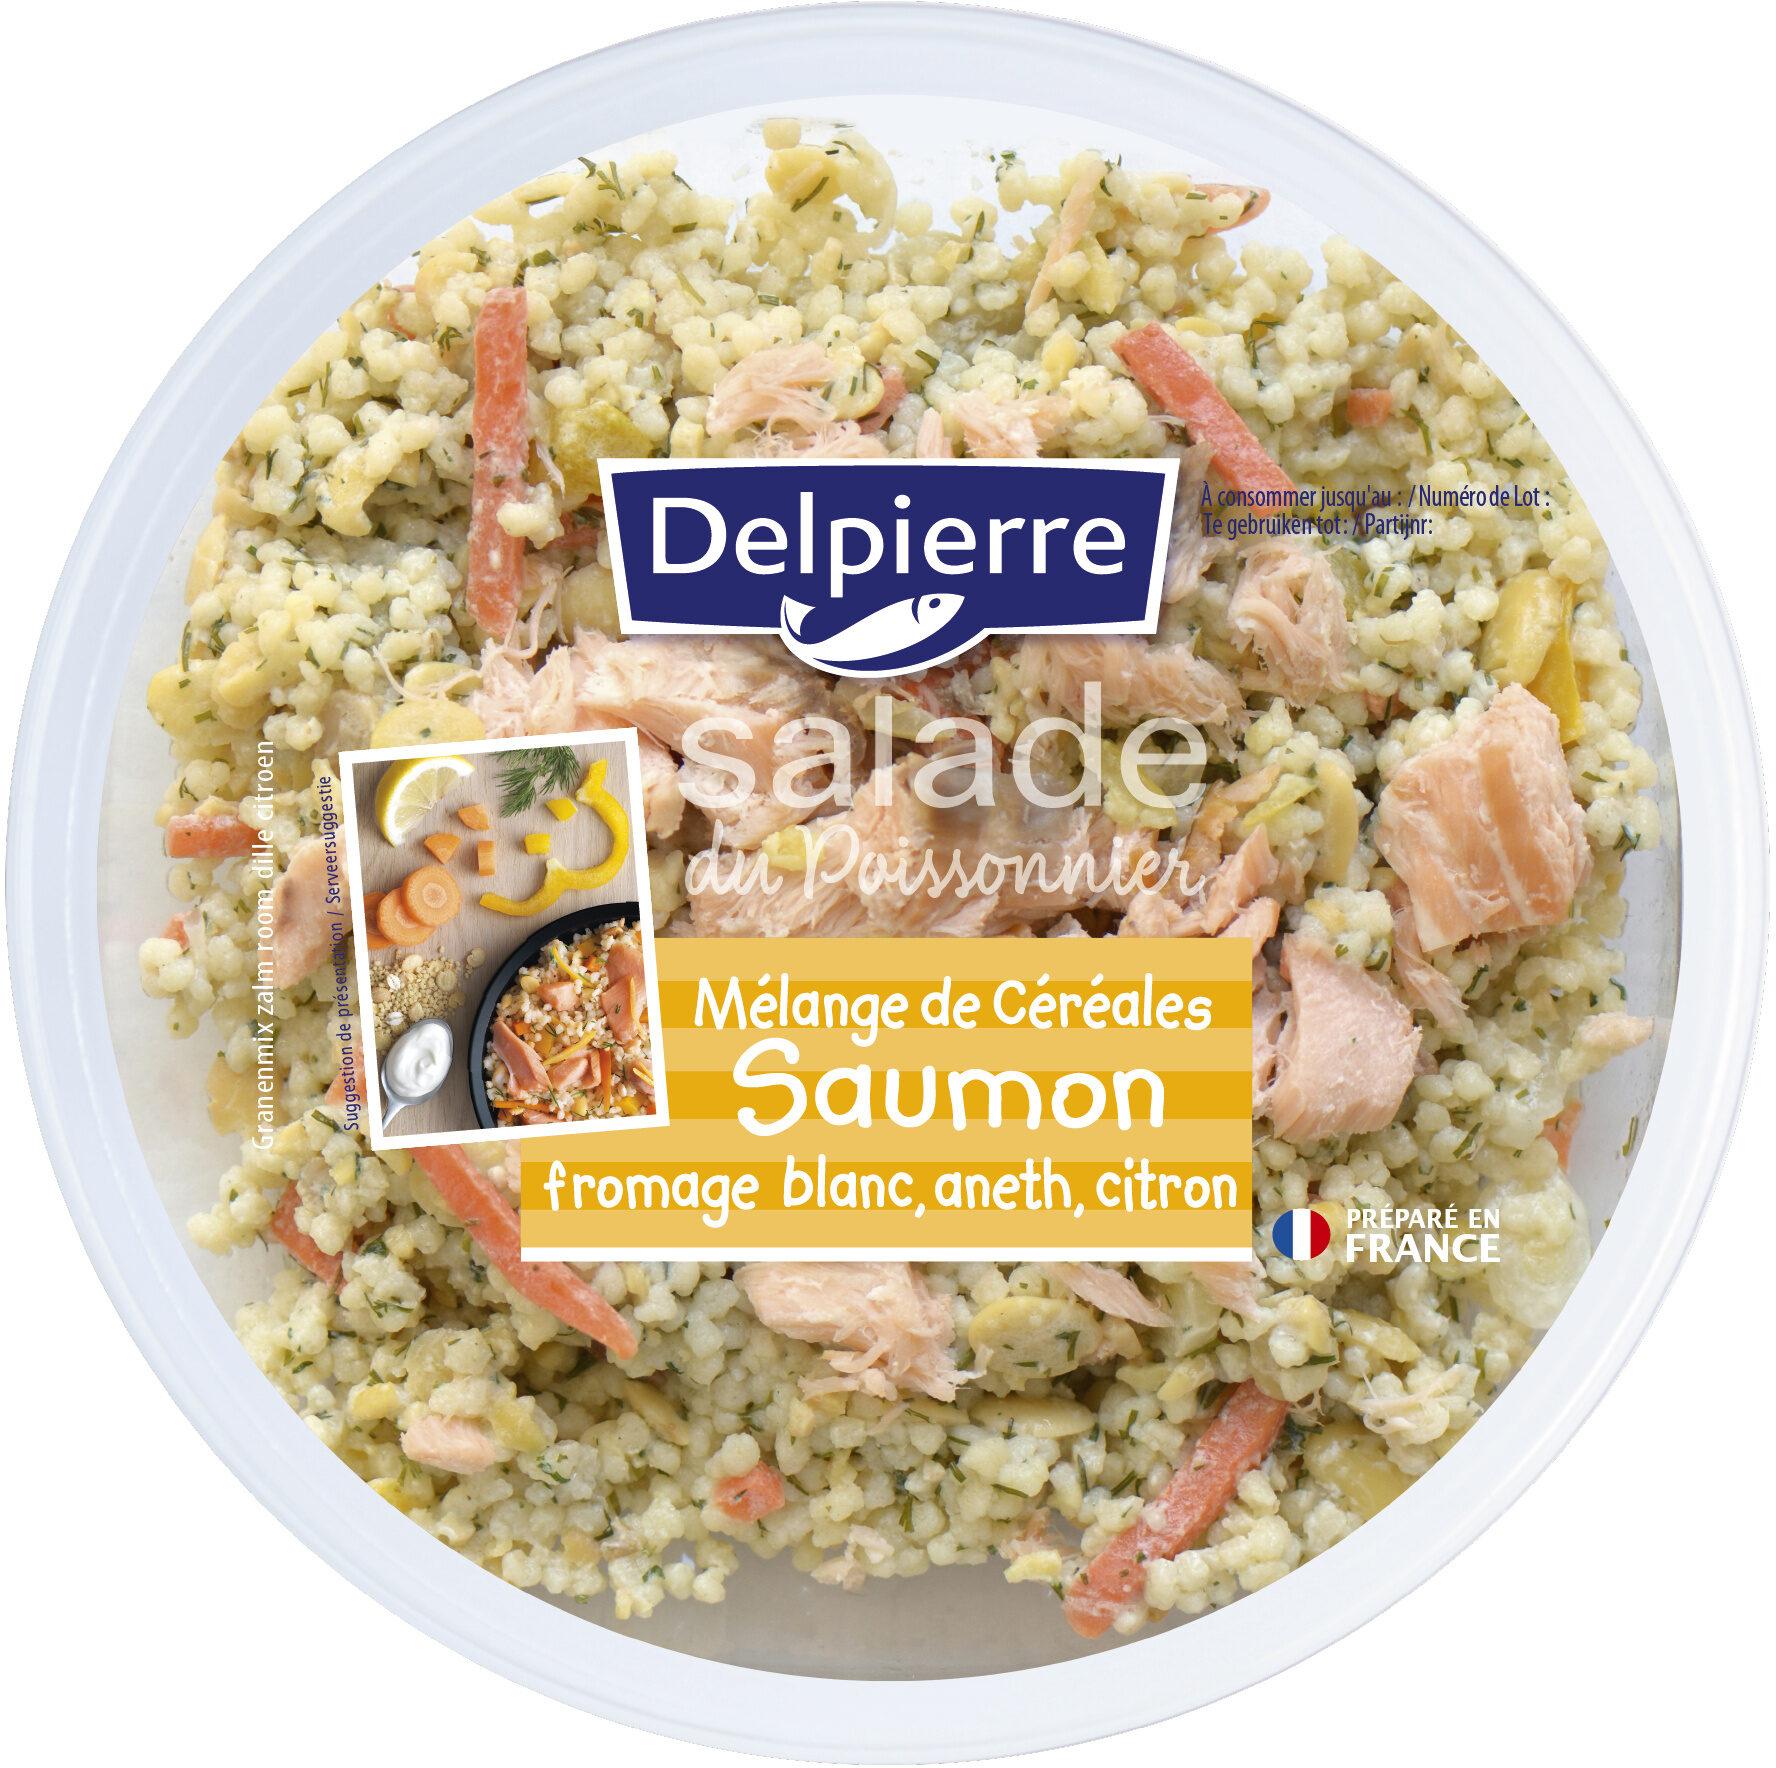 Salade du poissonier - Product - fr